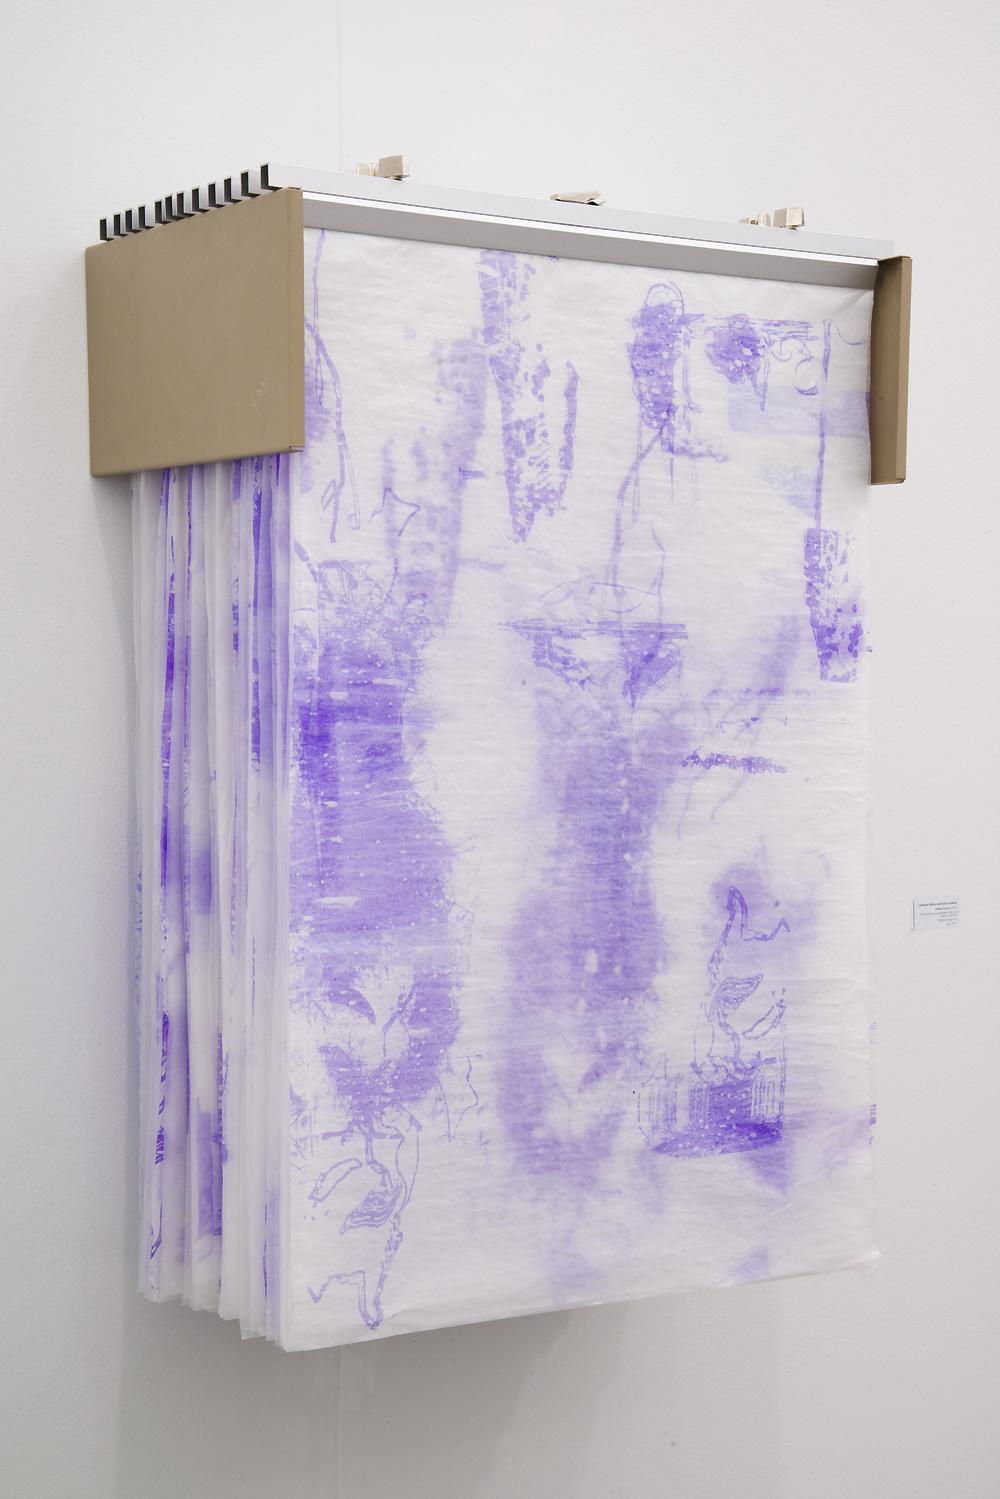 Valerie Snobeck / Catherine Sullivan,  Limited Good 8,  2013, glassine hectograph prints in blueprint rack, 36.5 x 63.5 x 38 inch